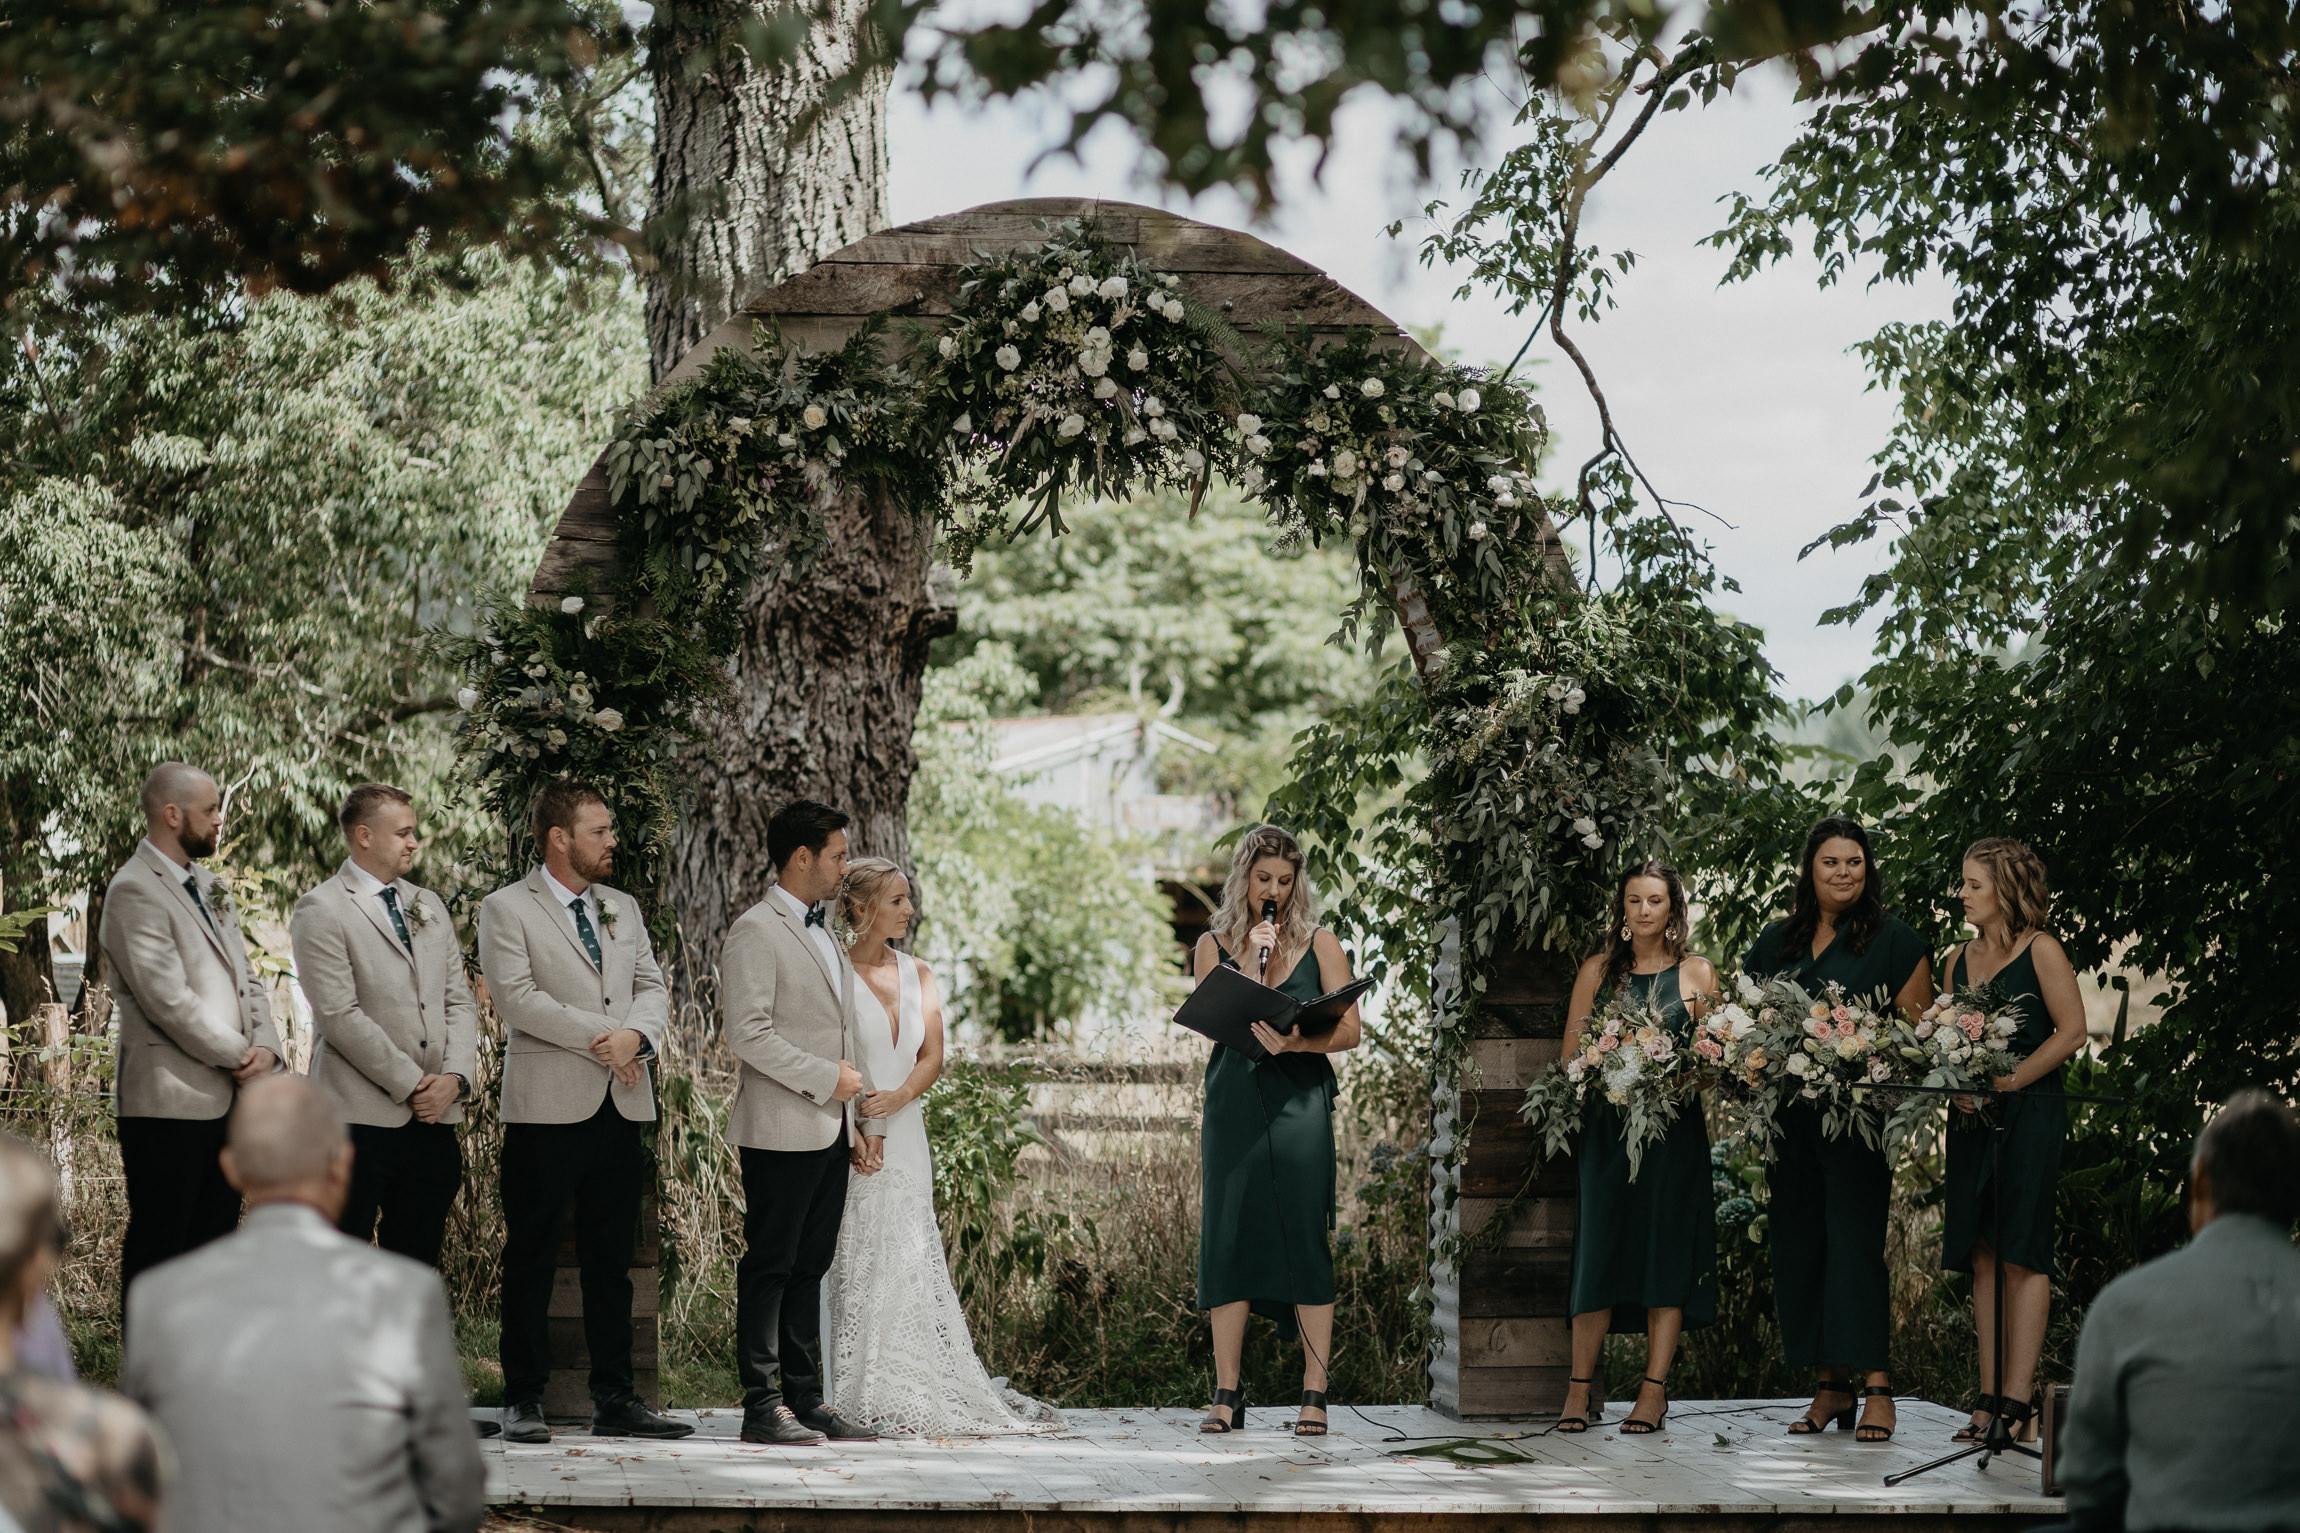 oldforestschool-wedding-blog-105.jpg